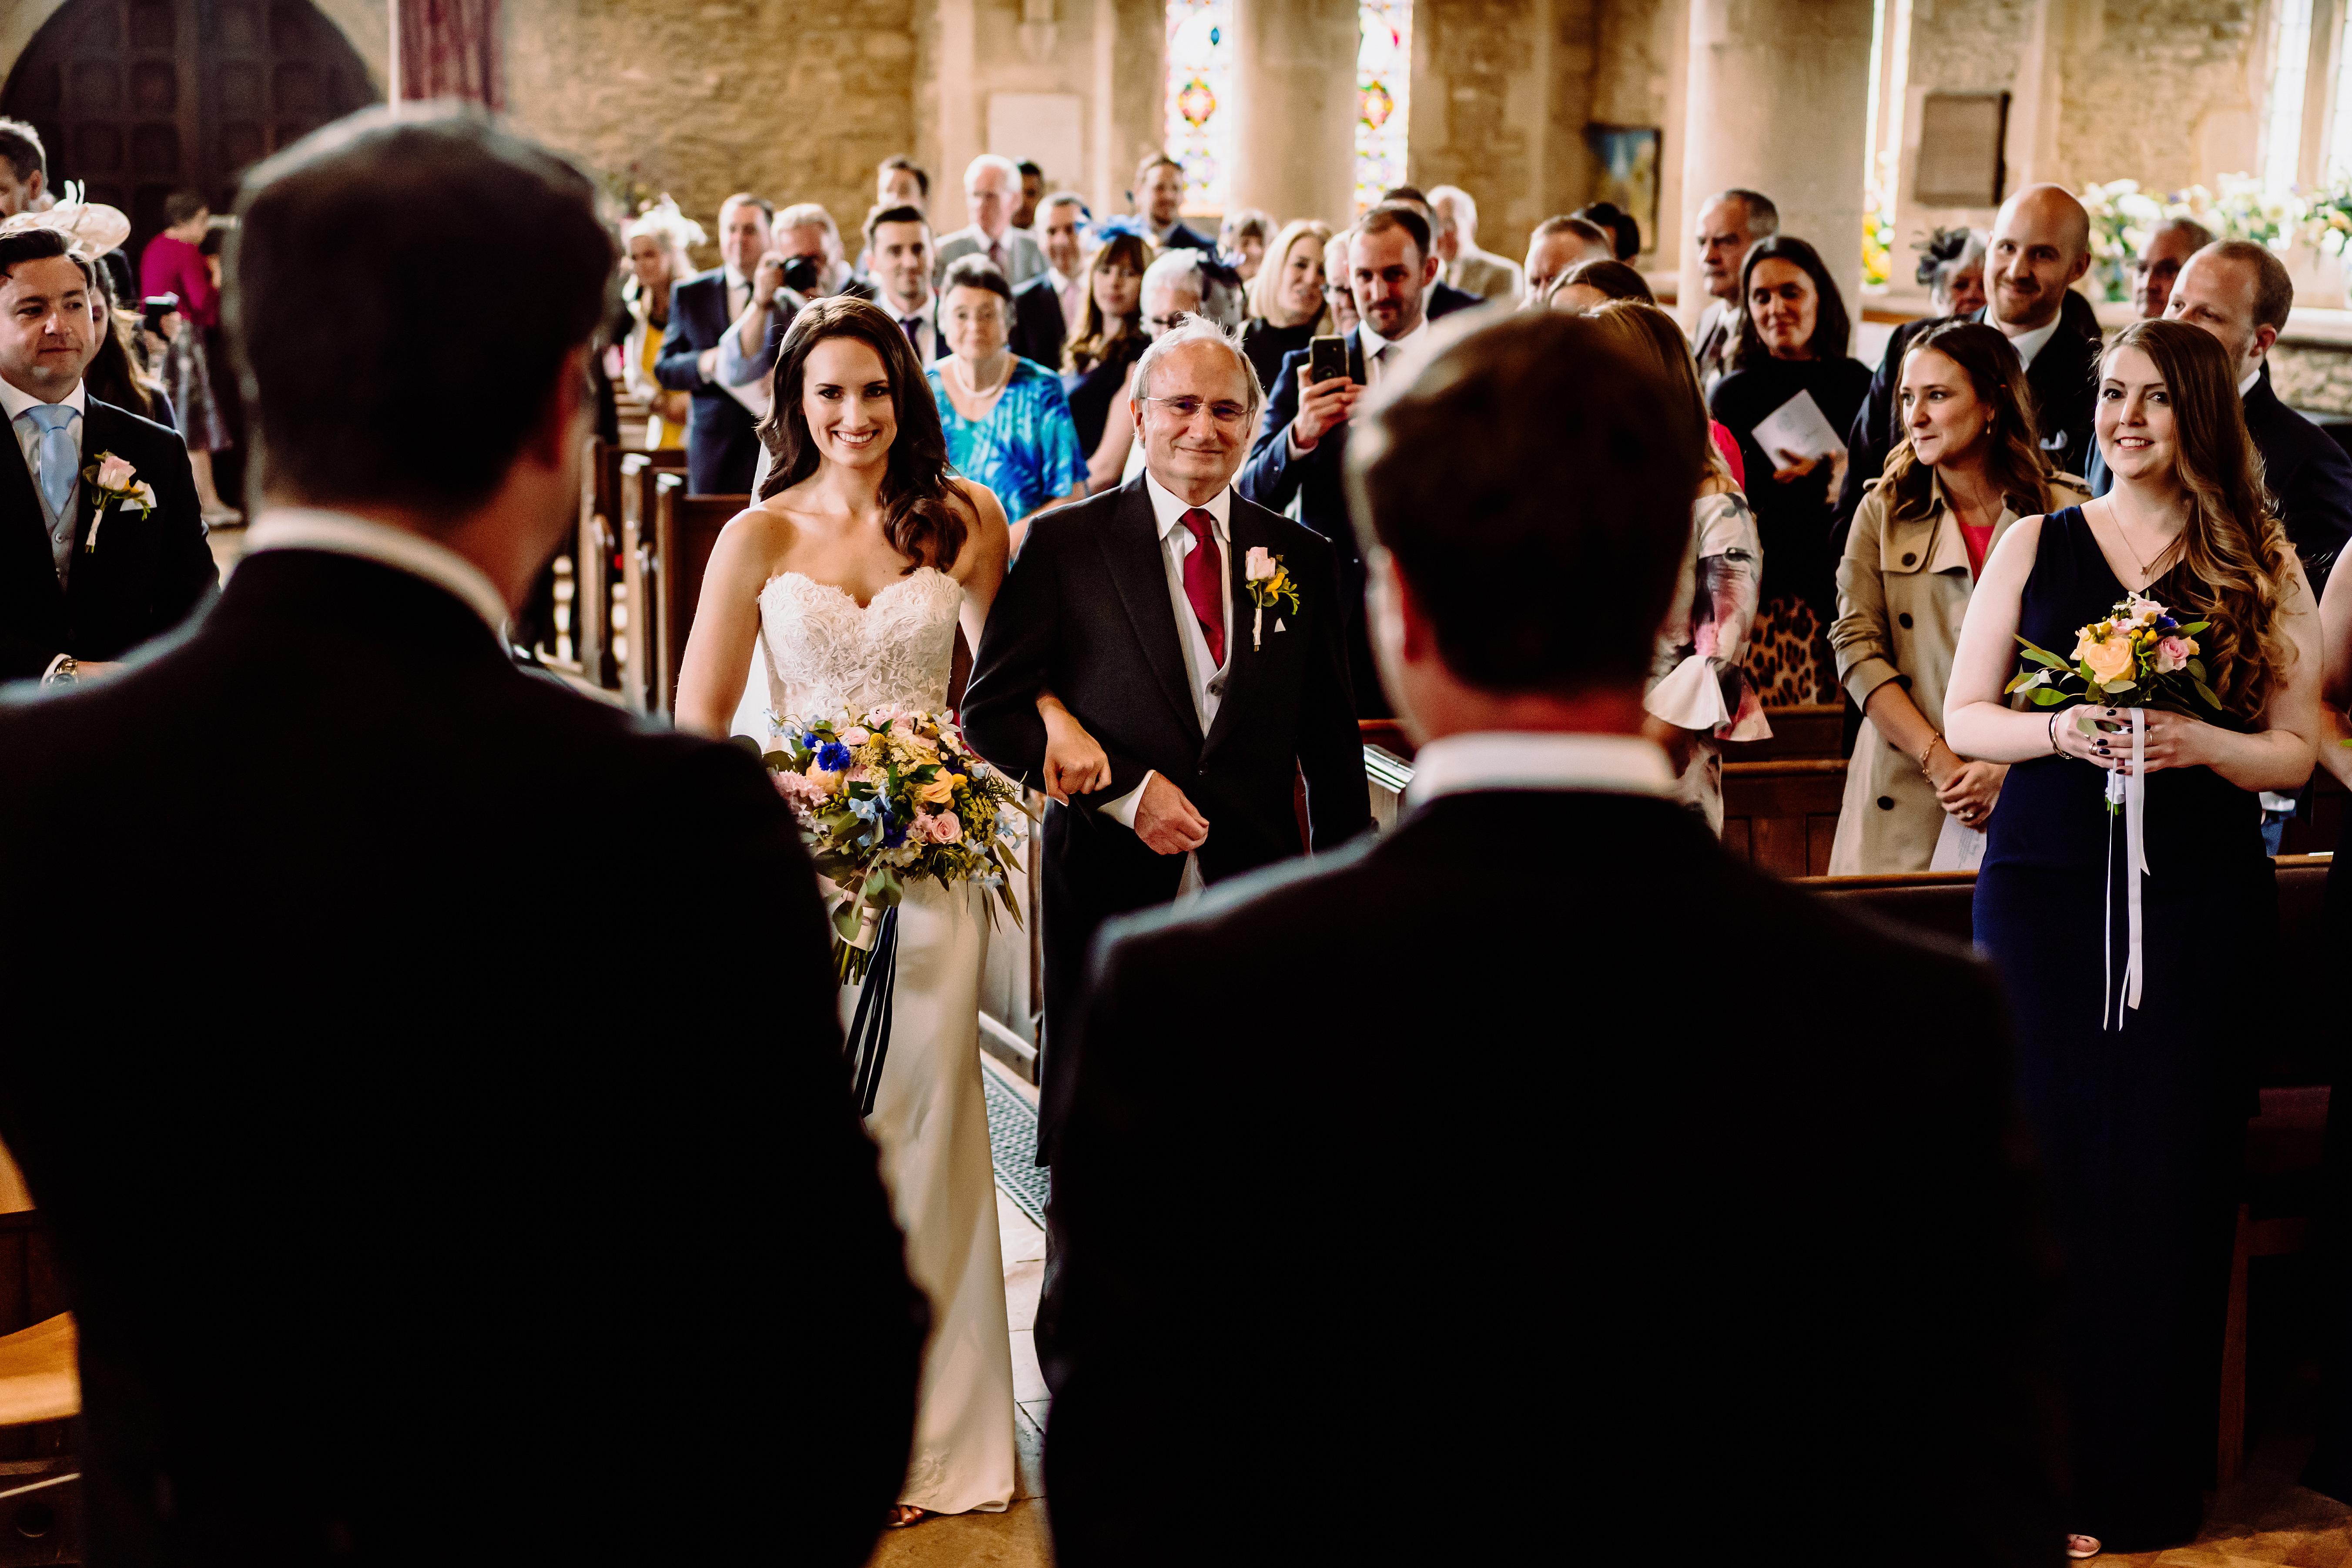 wedding photography at bampton church